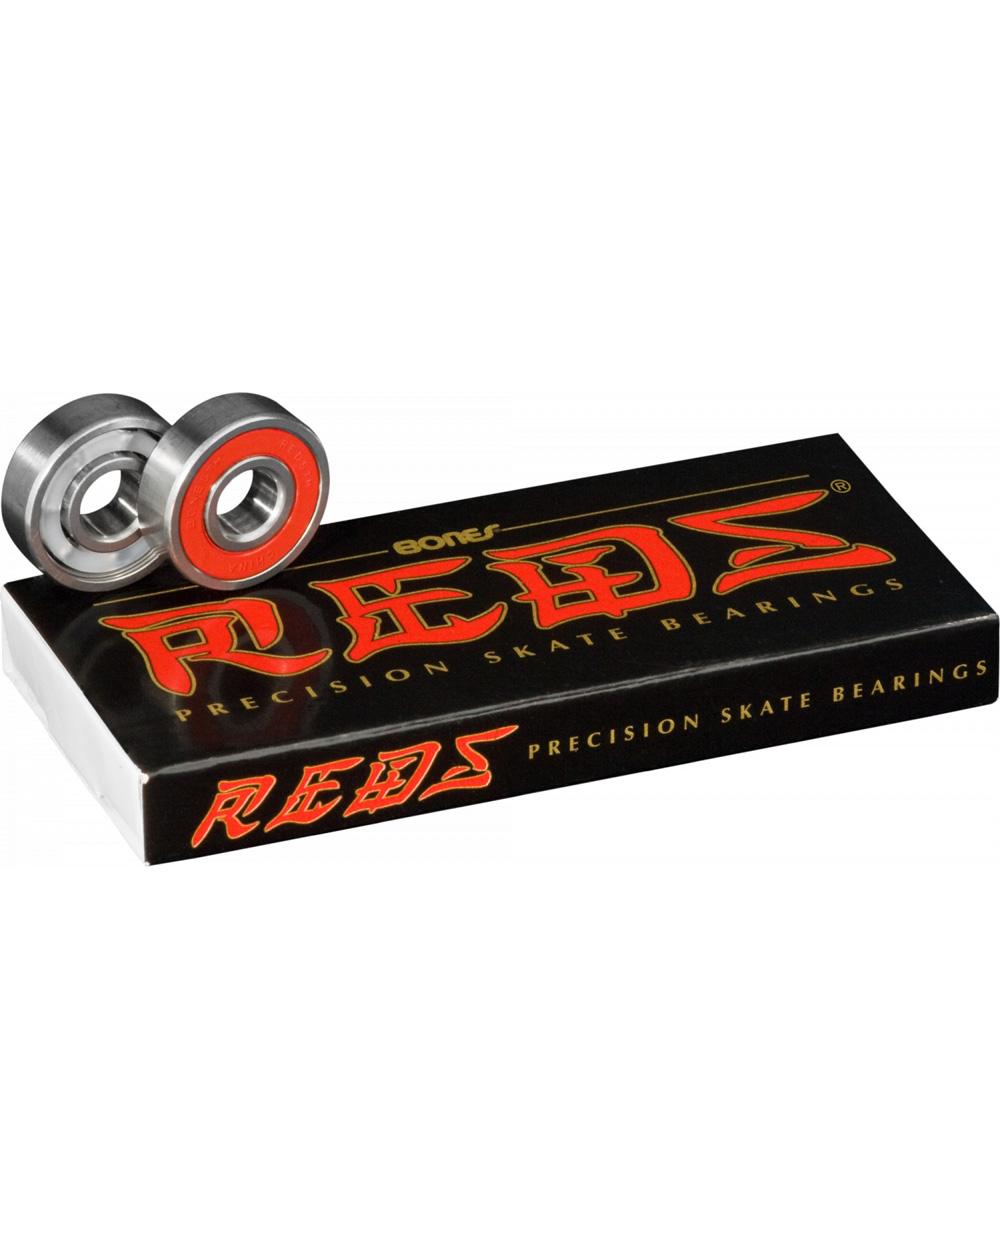 Bones Bearings Reds Skateboard Bearings